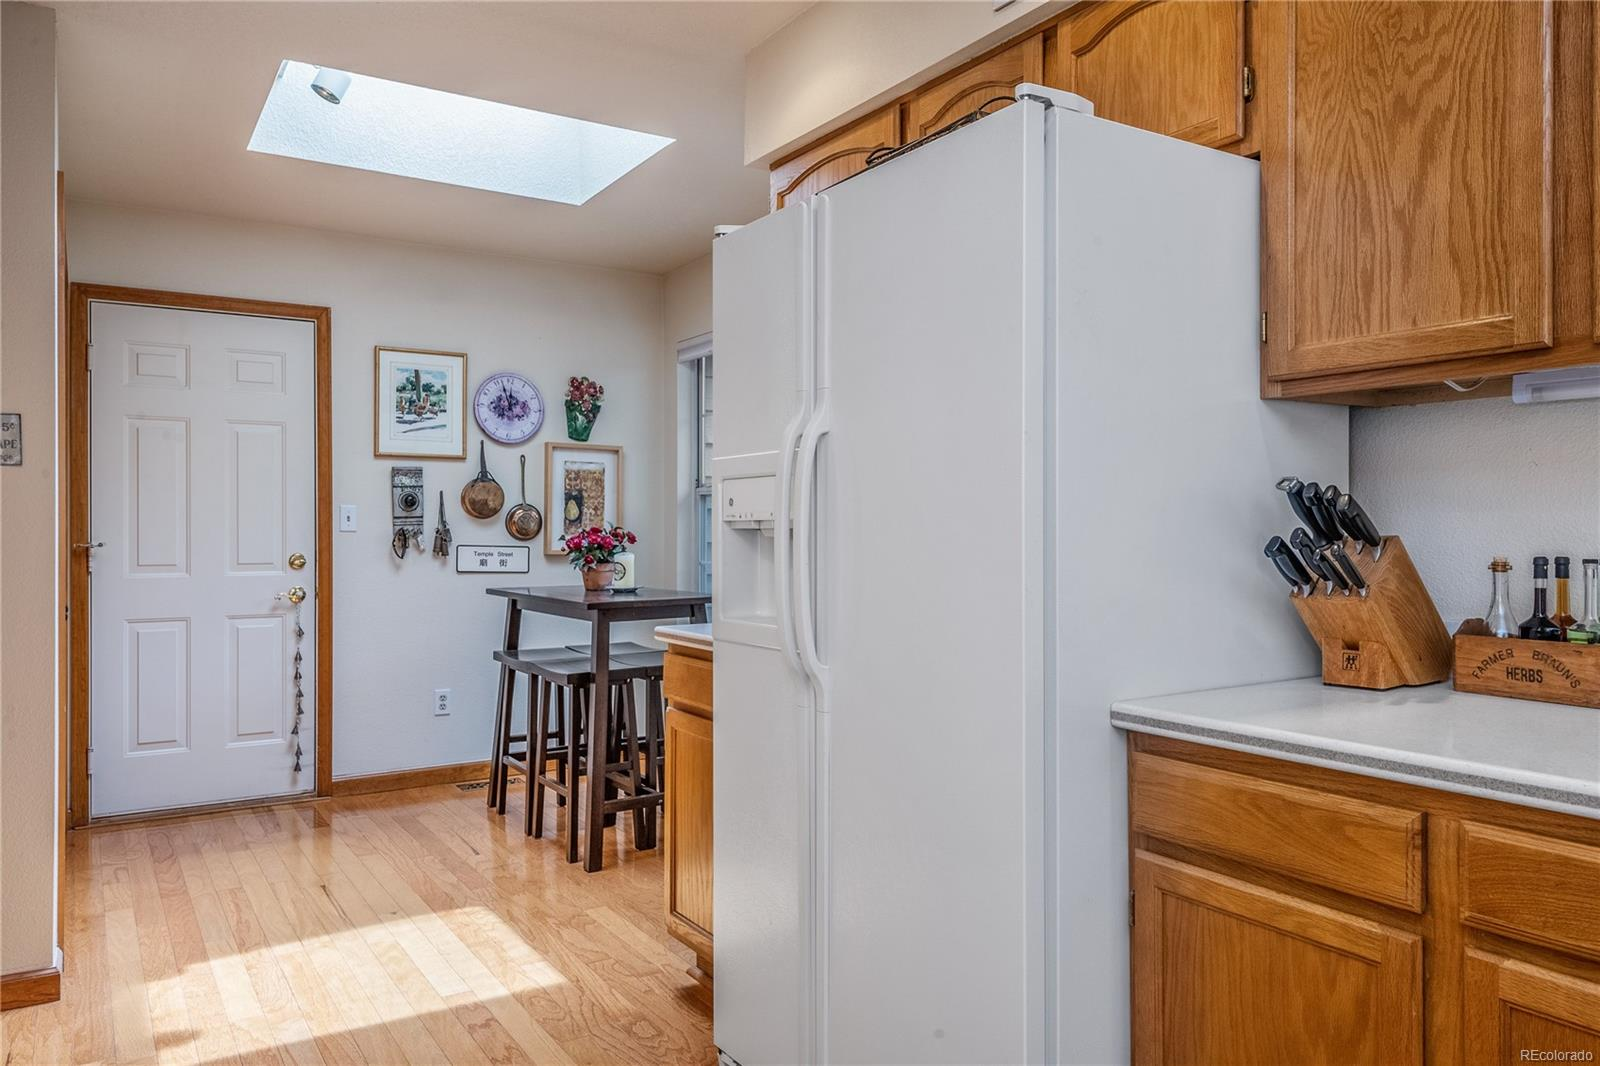 Kitchen, Nook, Pantry